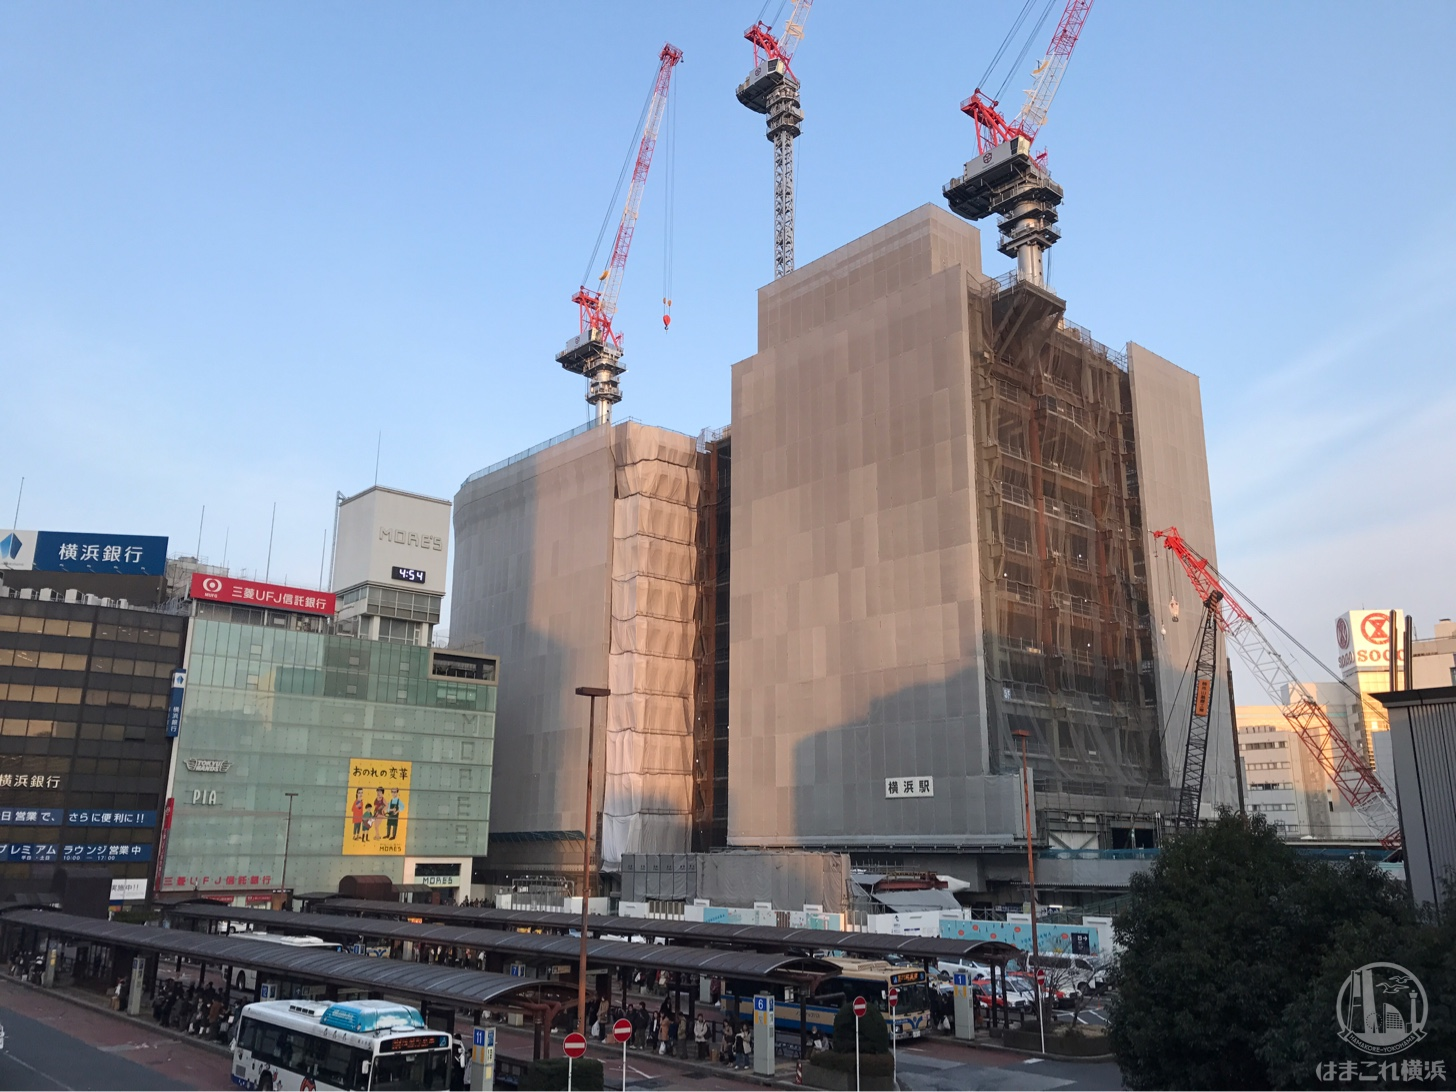 2018年2月 横浜駅西口の様子